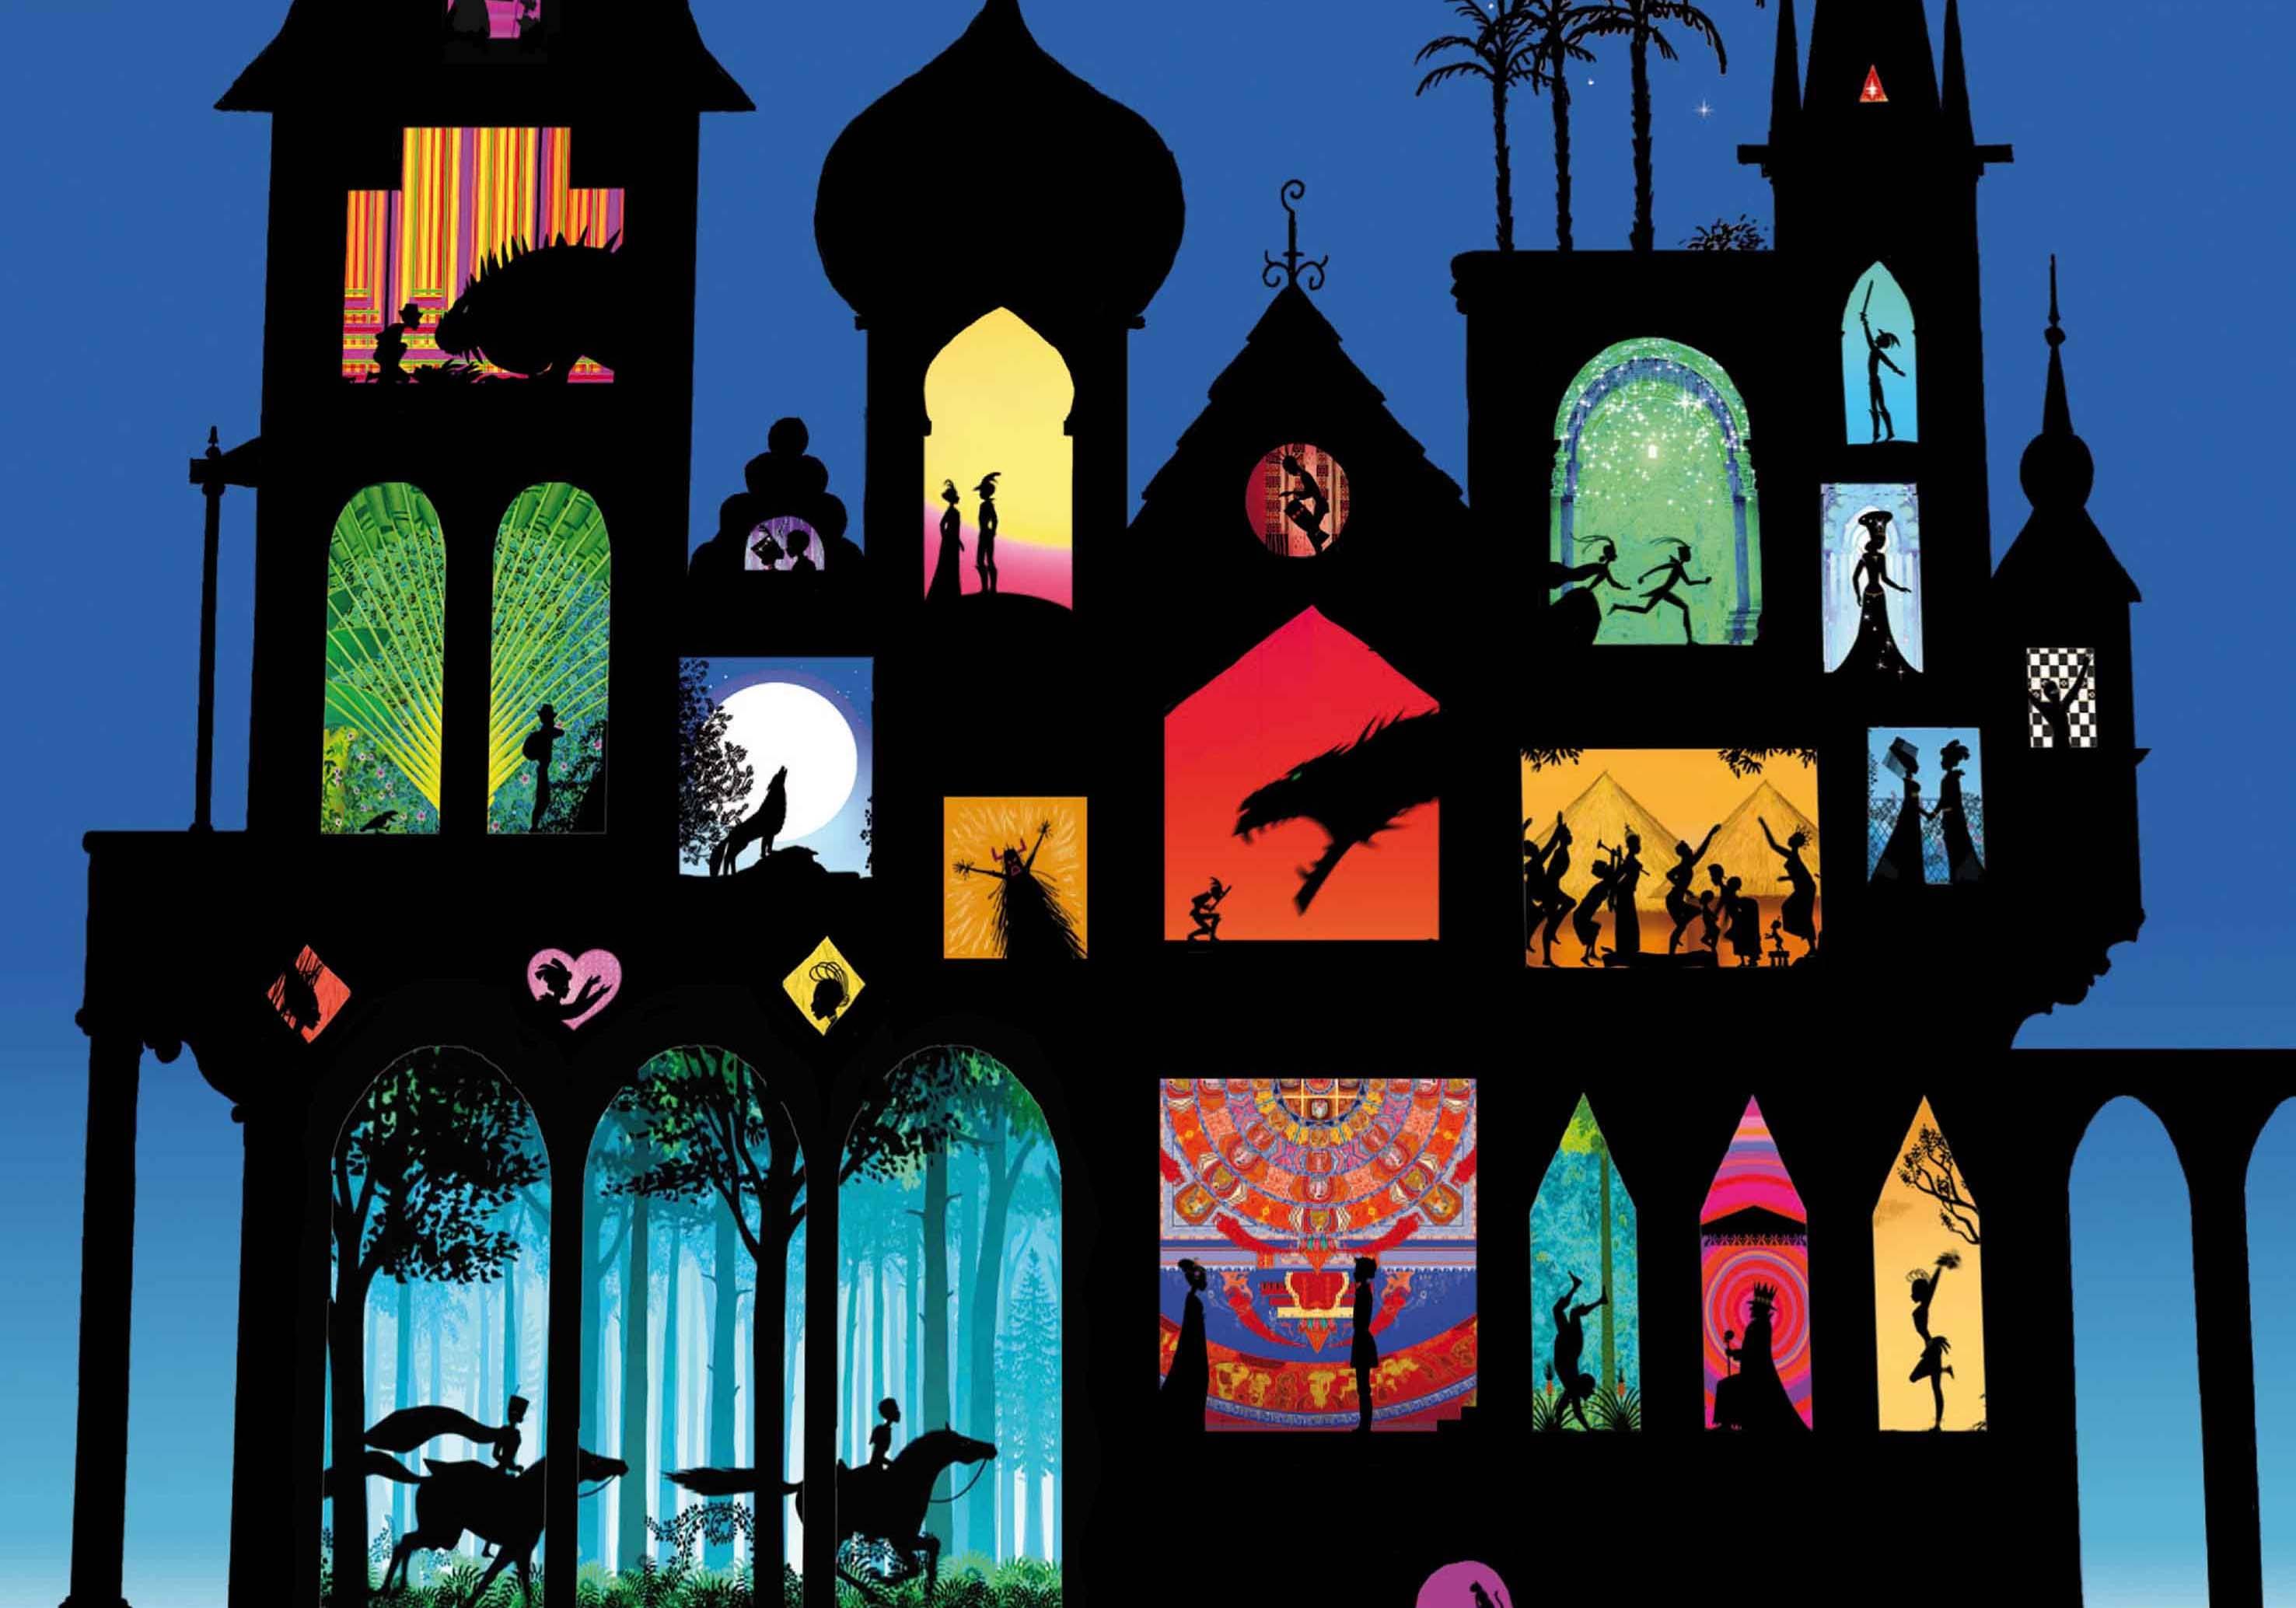 Les Contes de la nuit, de Michel Ocelot